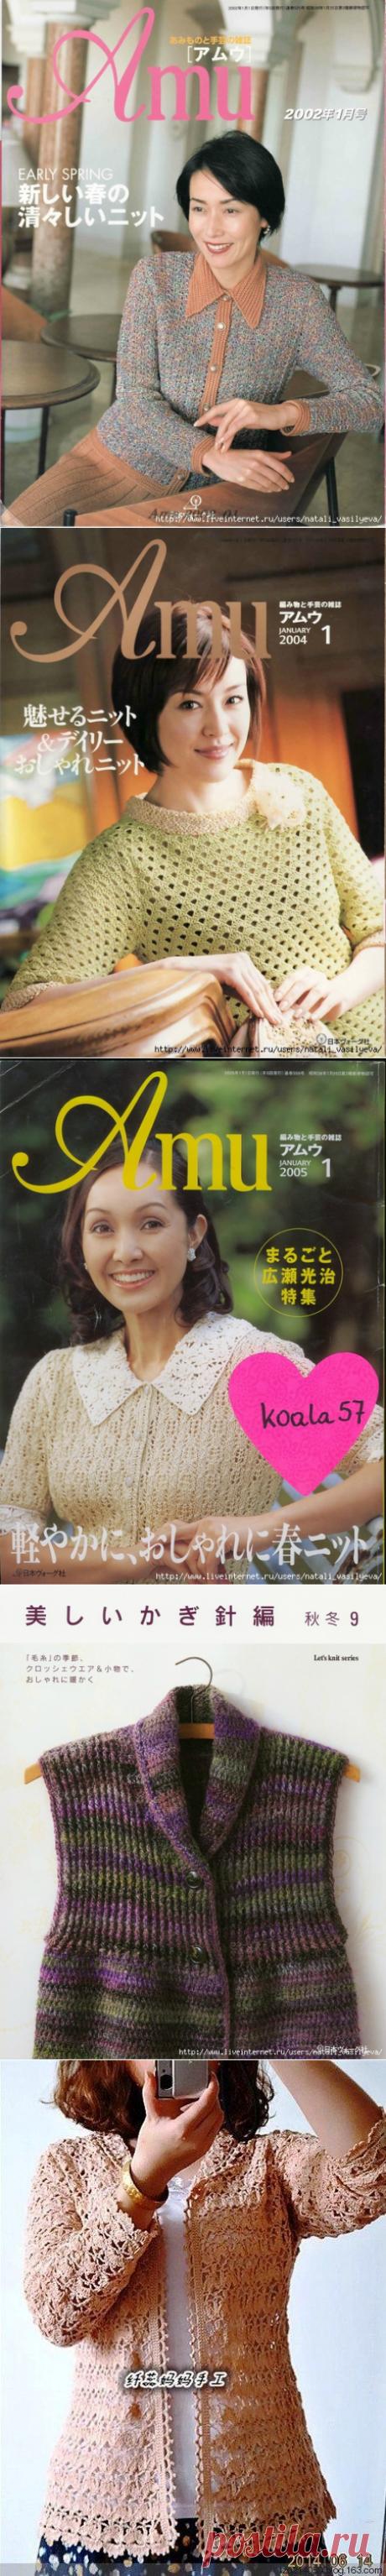 - KNITTING the HOOK - the Japanese azhura | Records in a heading - KNITTING the HOOK - the Japanese azhura | the Diary Natali_Vasilyeva